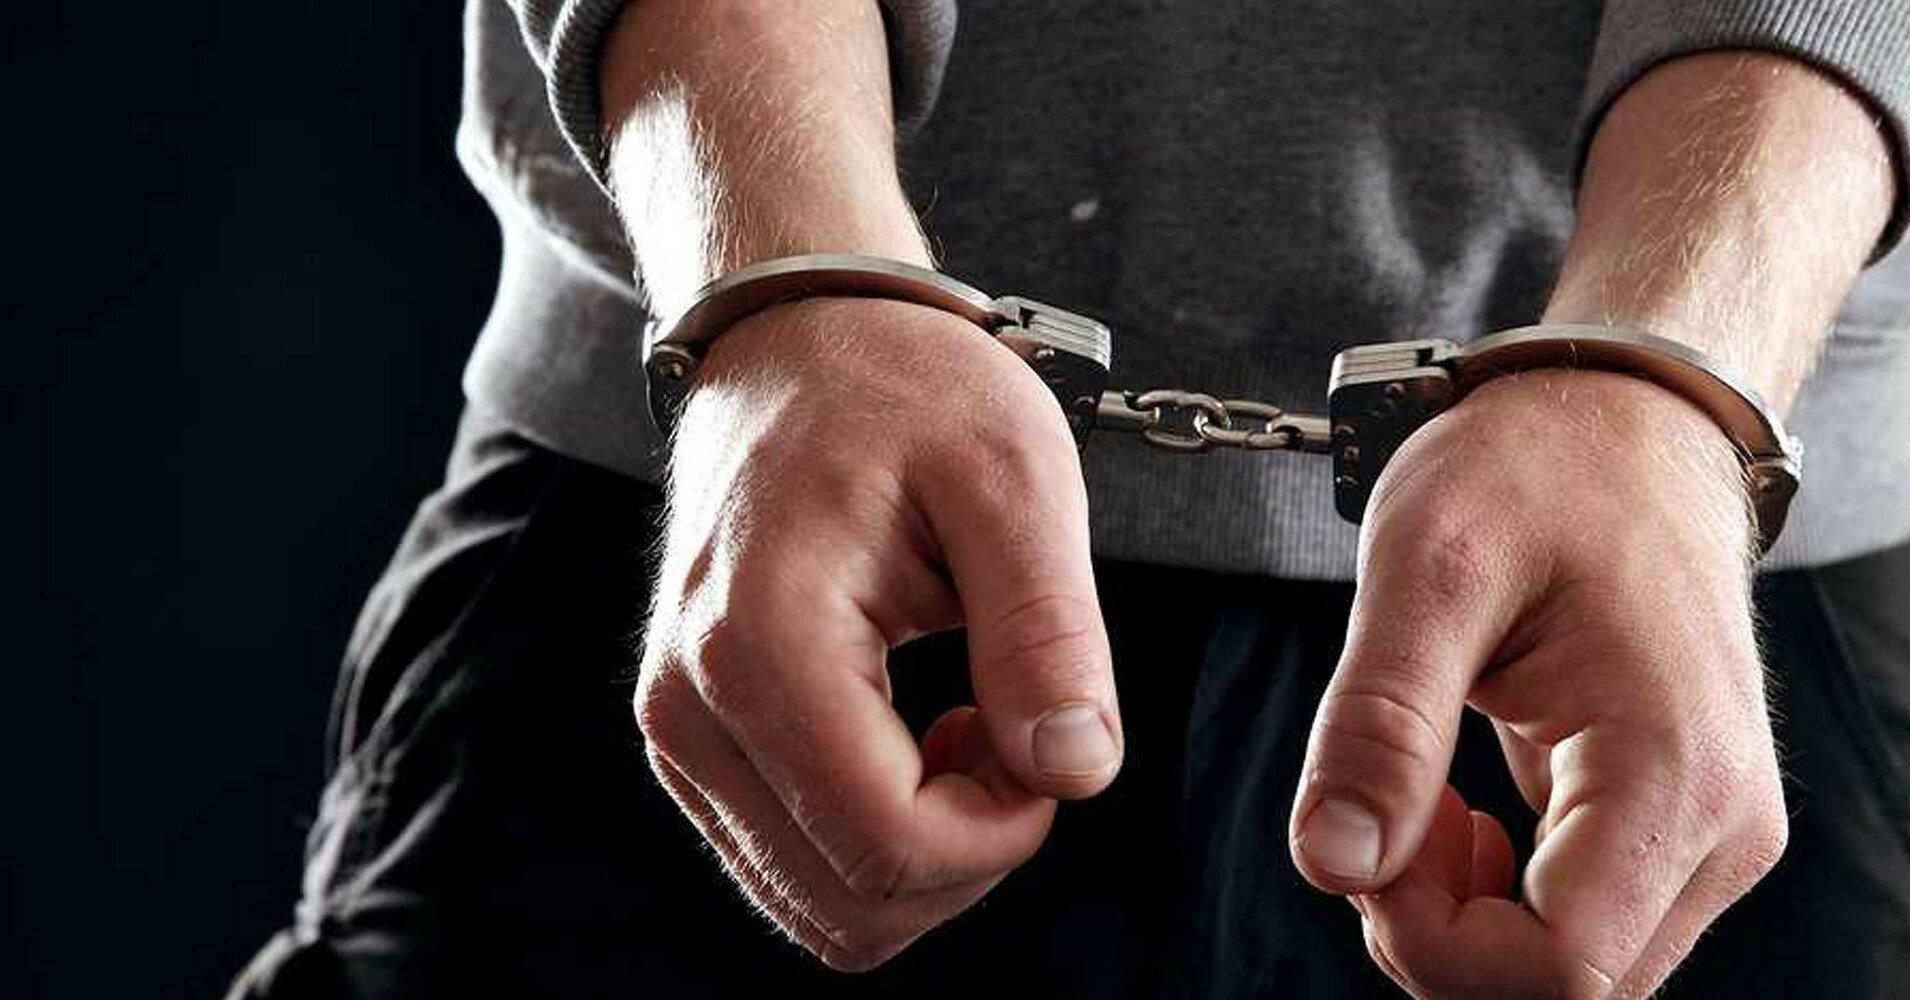 Экс-глава райгосадминистрации получил 9 лет за взятку